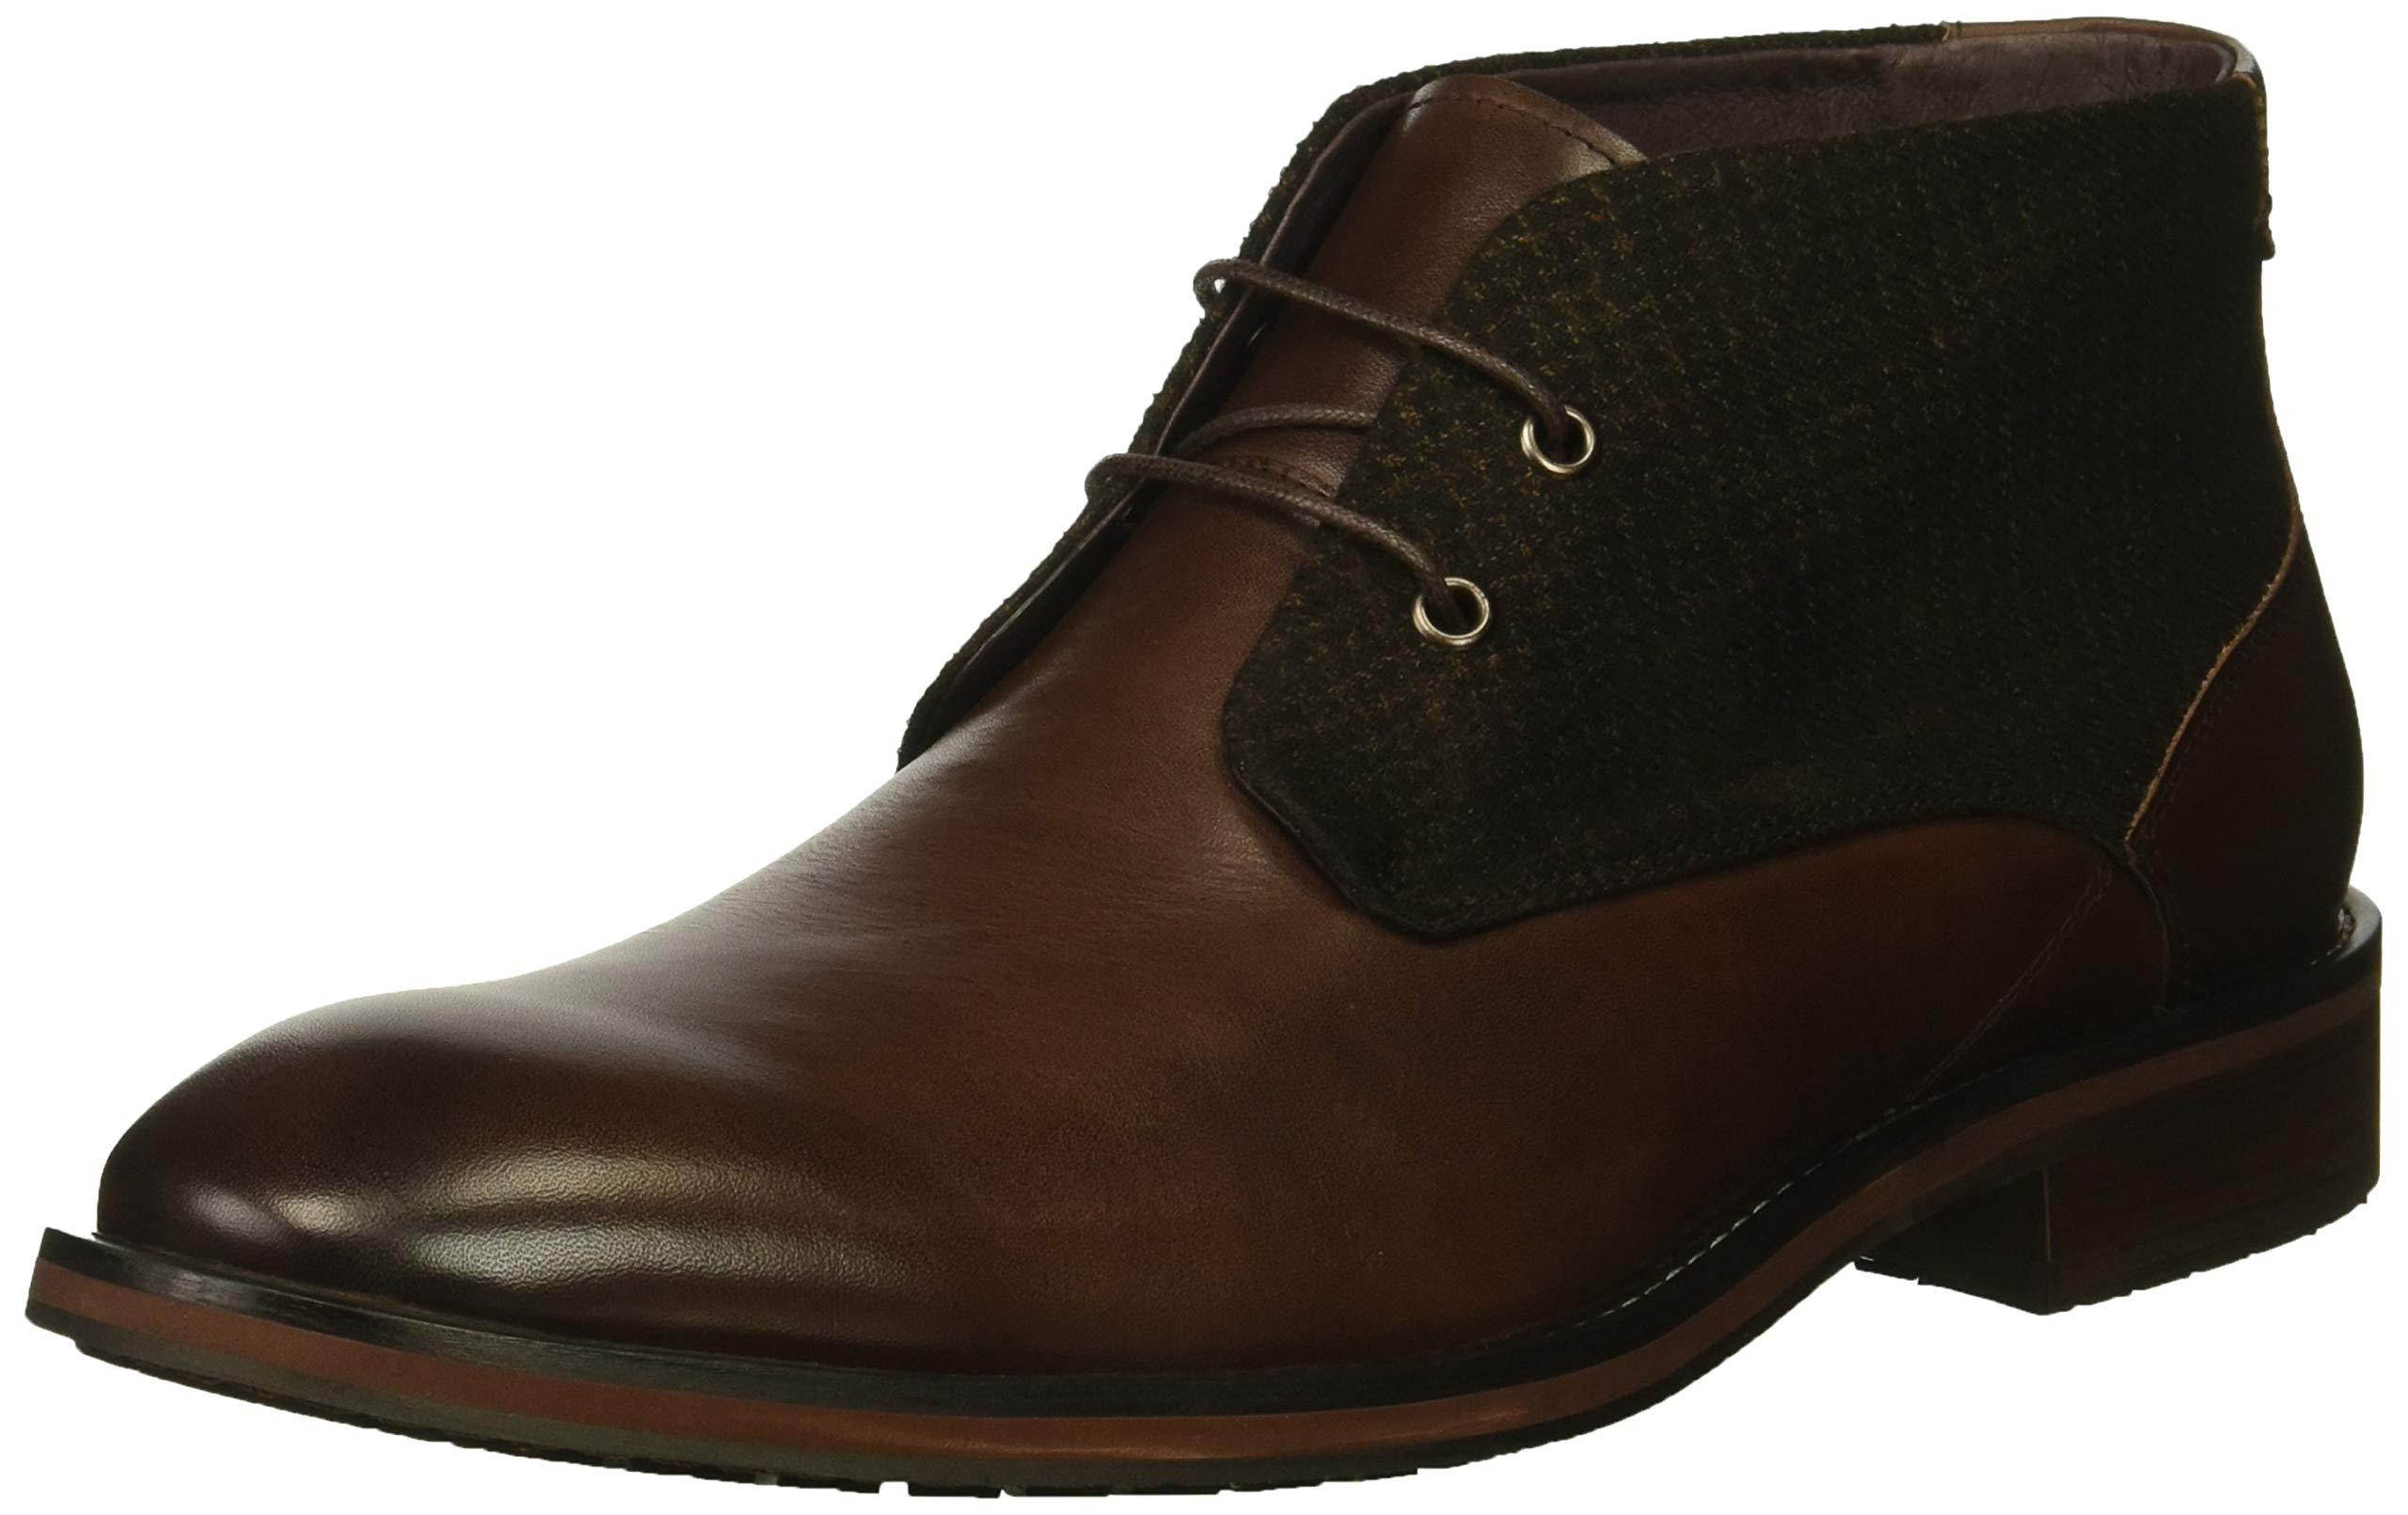 ZANZARA Men's NEBOT Chukka Boot, Brown, 10.5 M US by ZANZARA